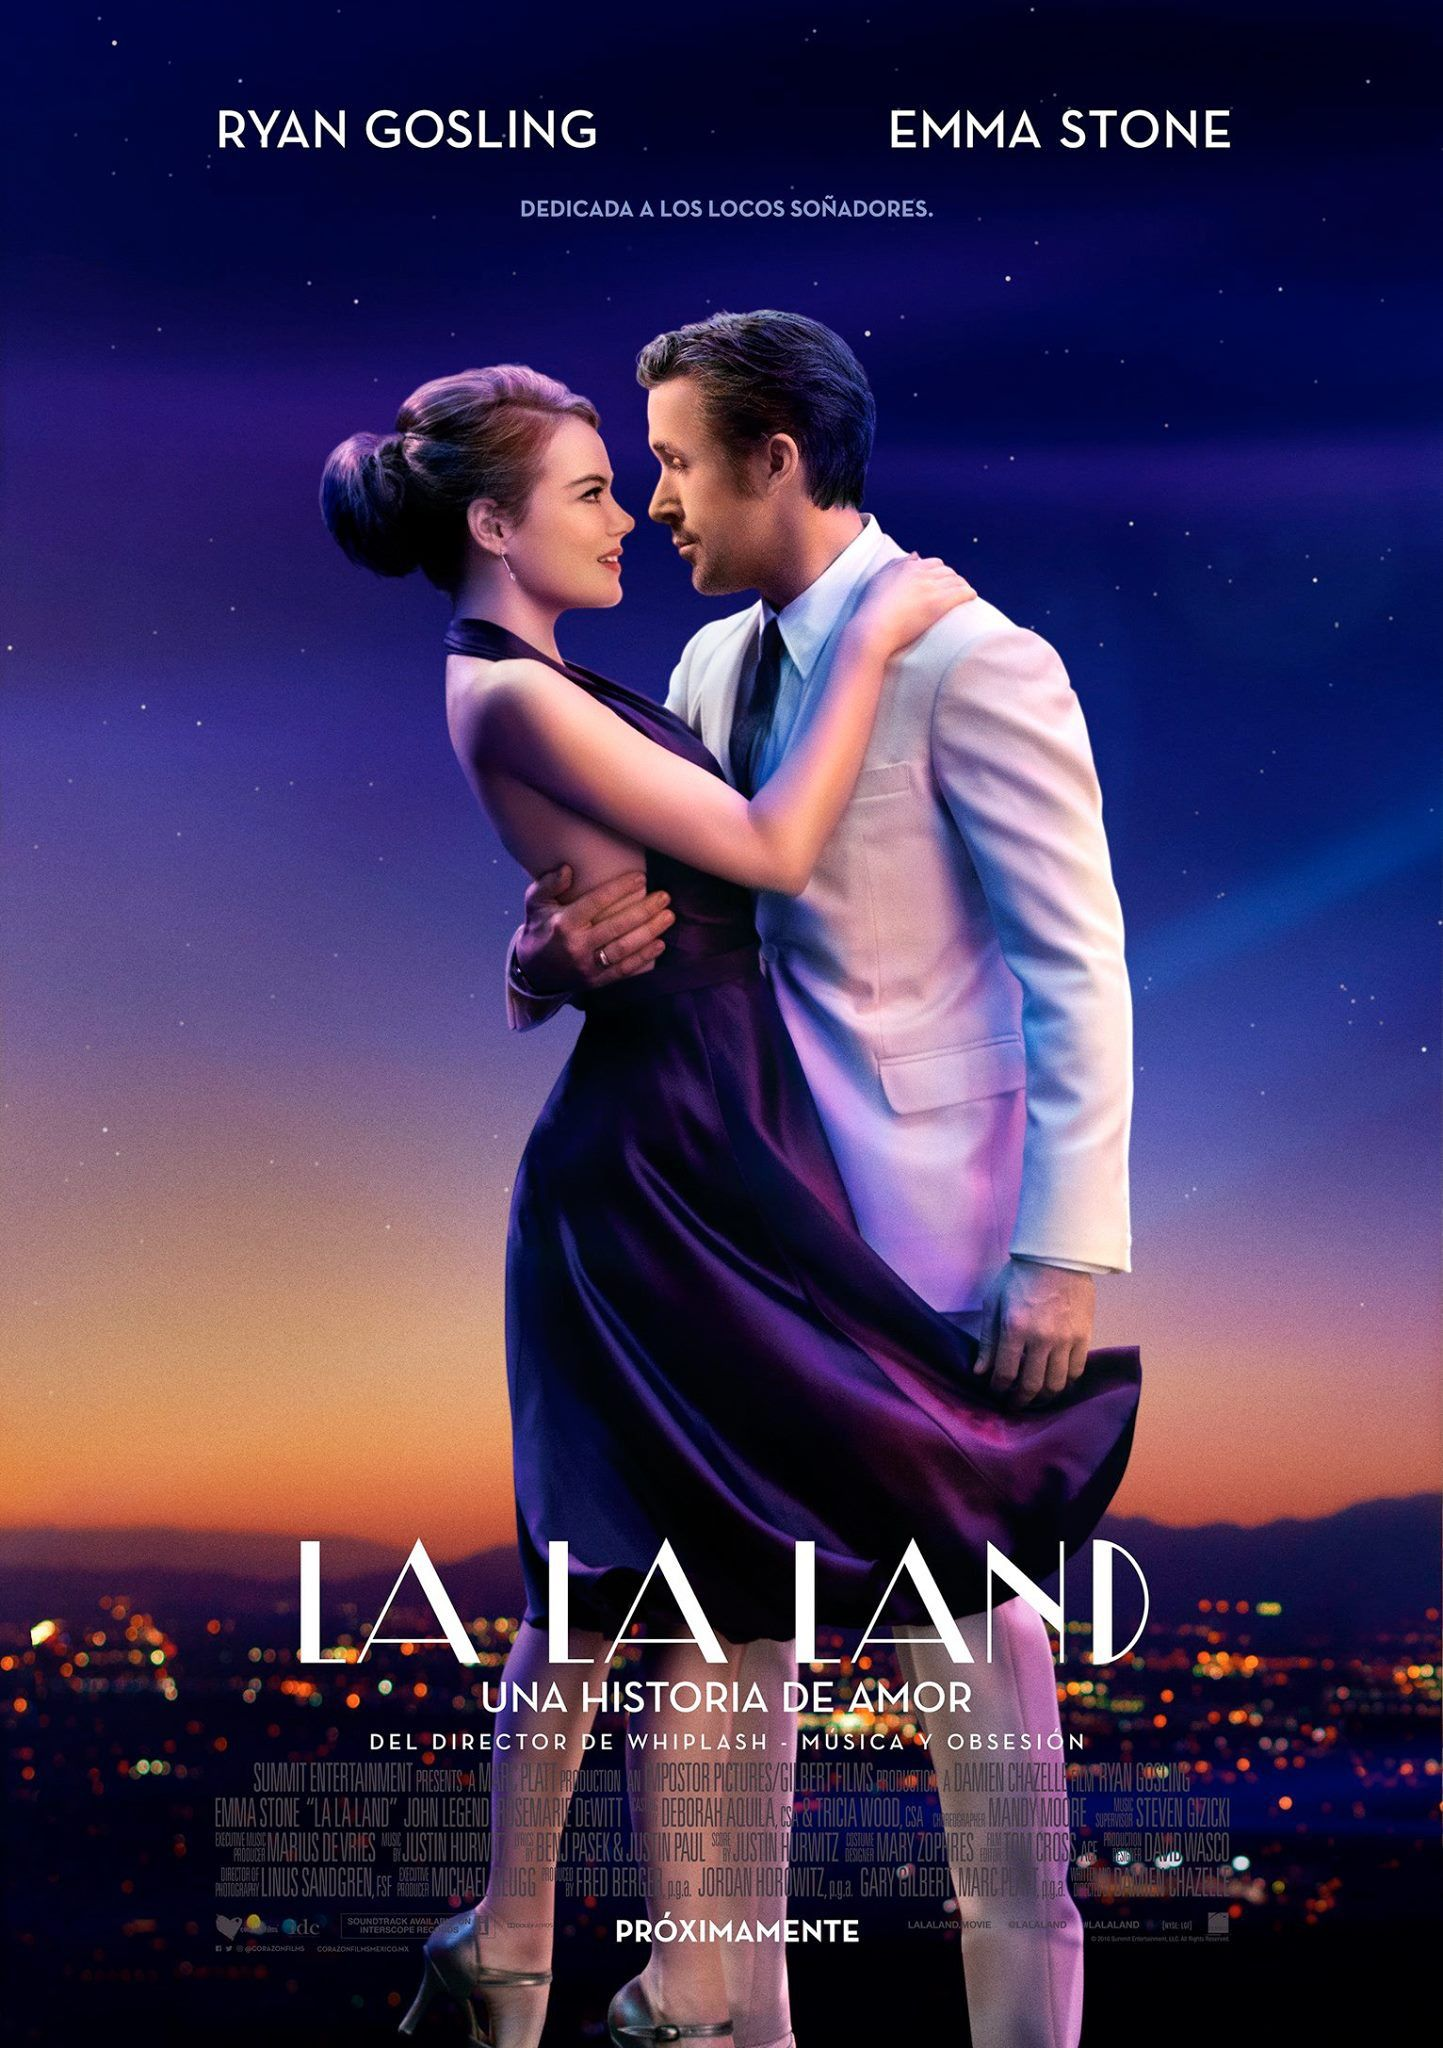 La La Land 2016 Hd Wallpaper From Gallsource Com Romantische Filme Musikfilme Romantischer Film